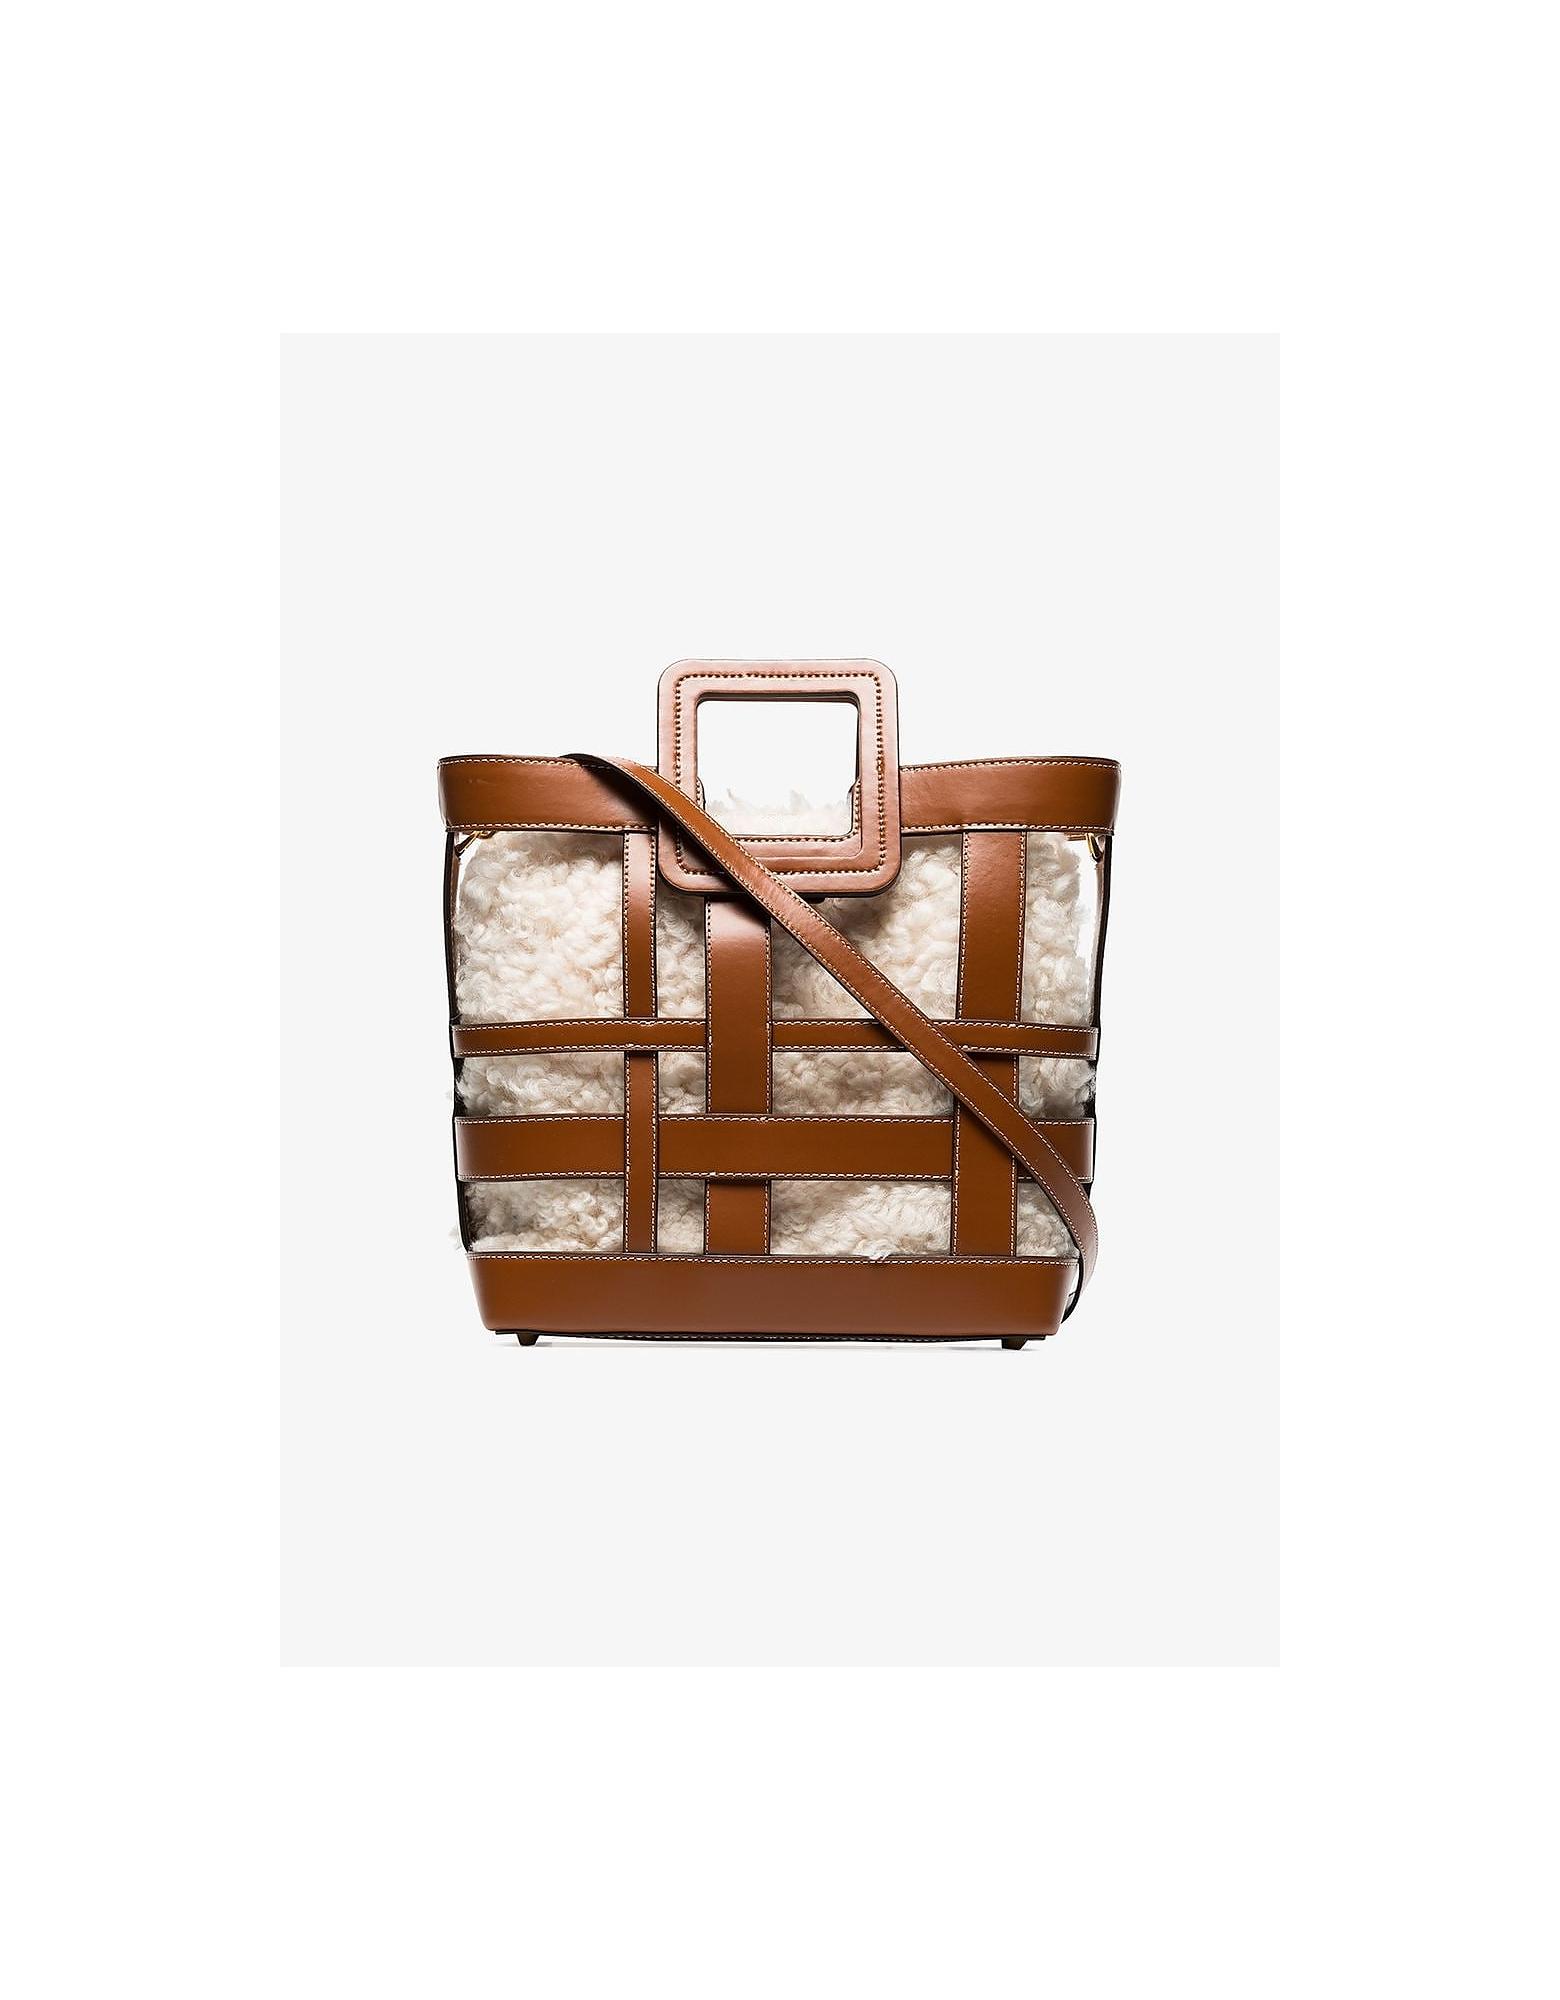 Staud Designer Handbags, Plaid Shirley Shearling Leather Tote Bag